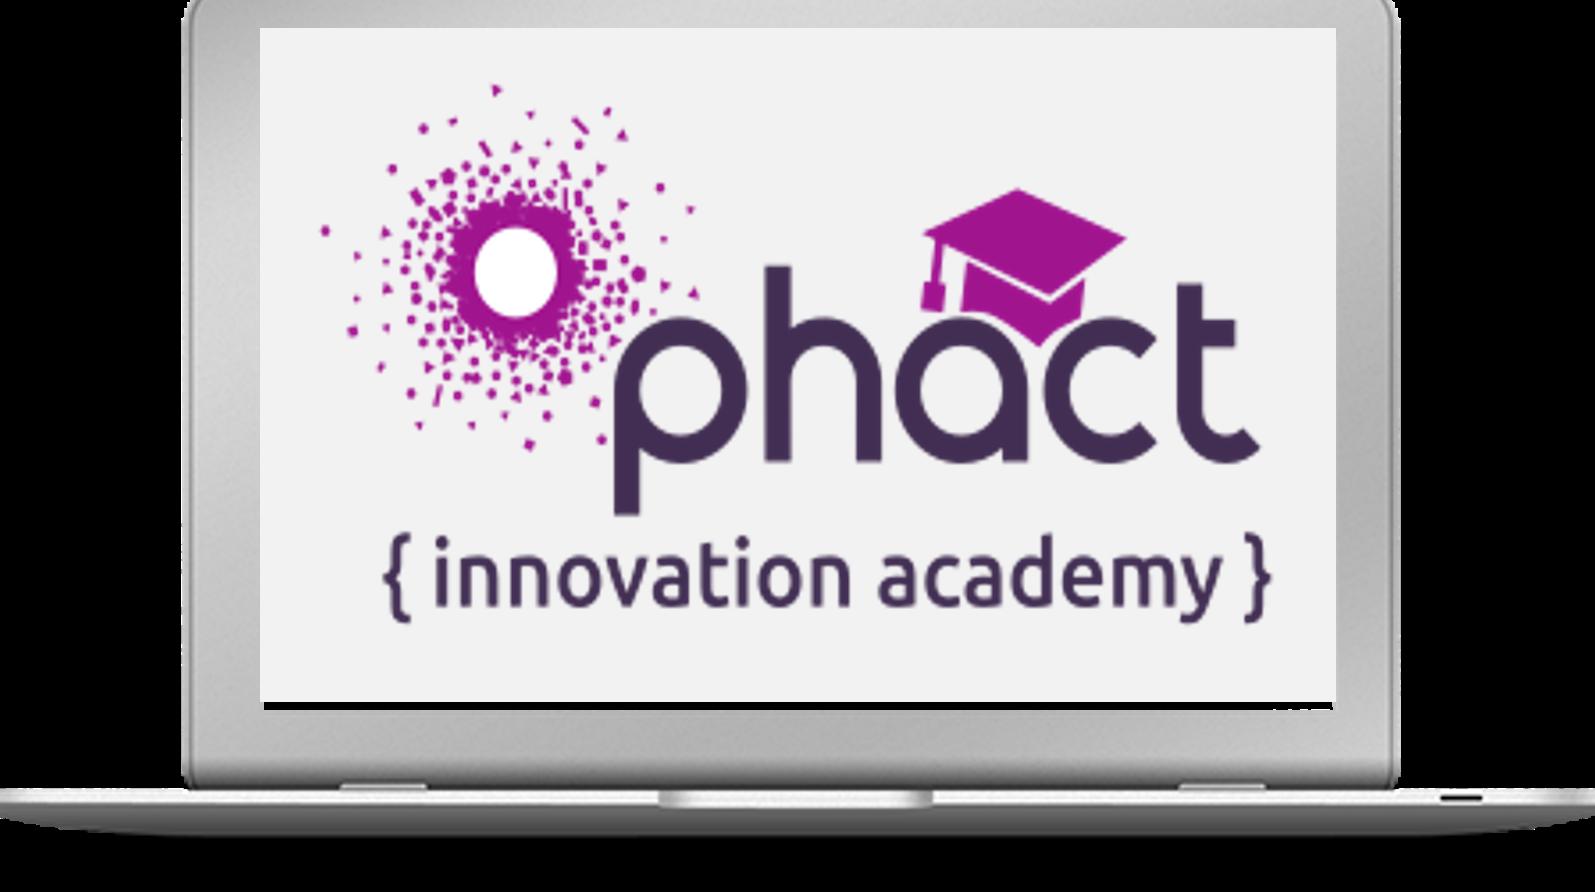 Phact webinar